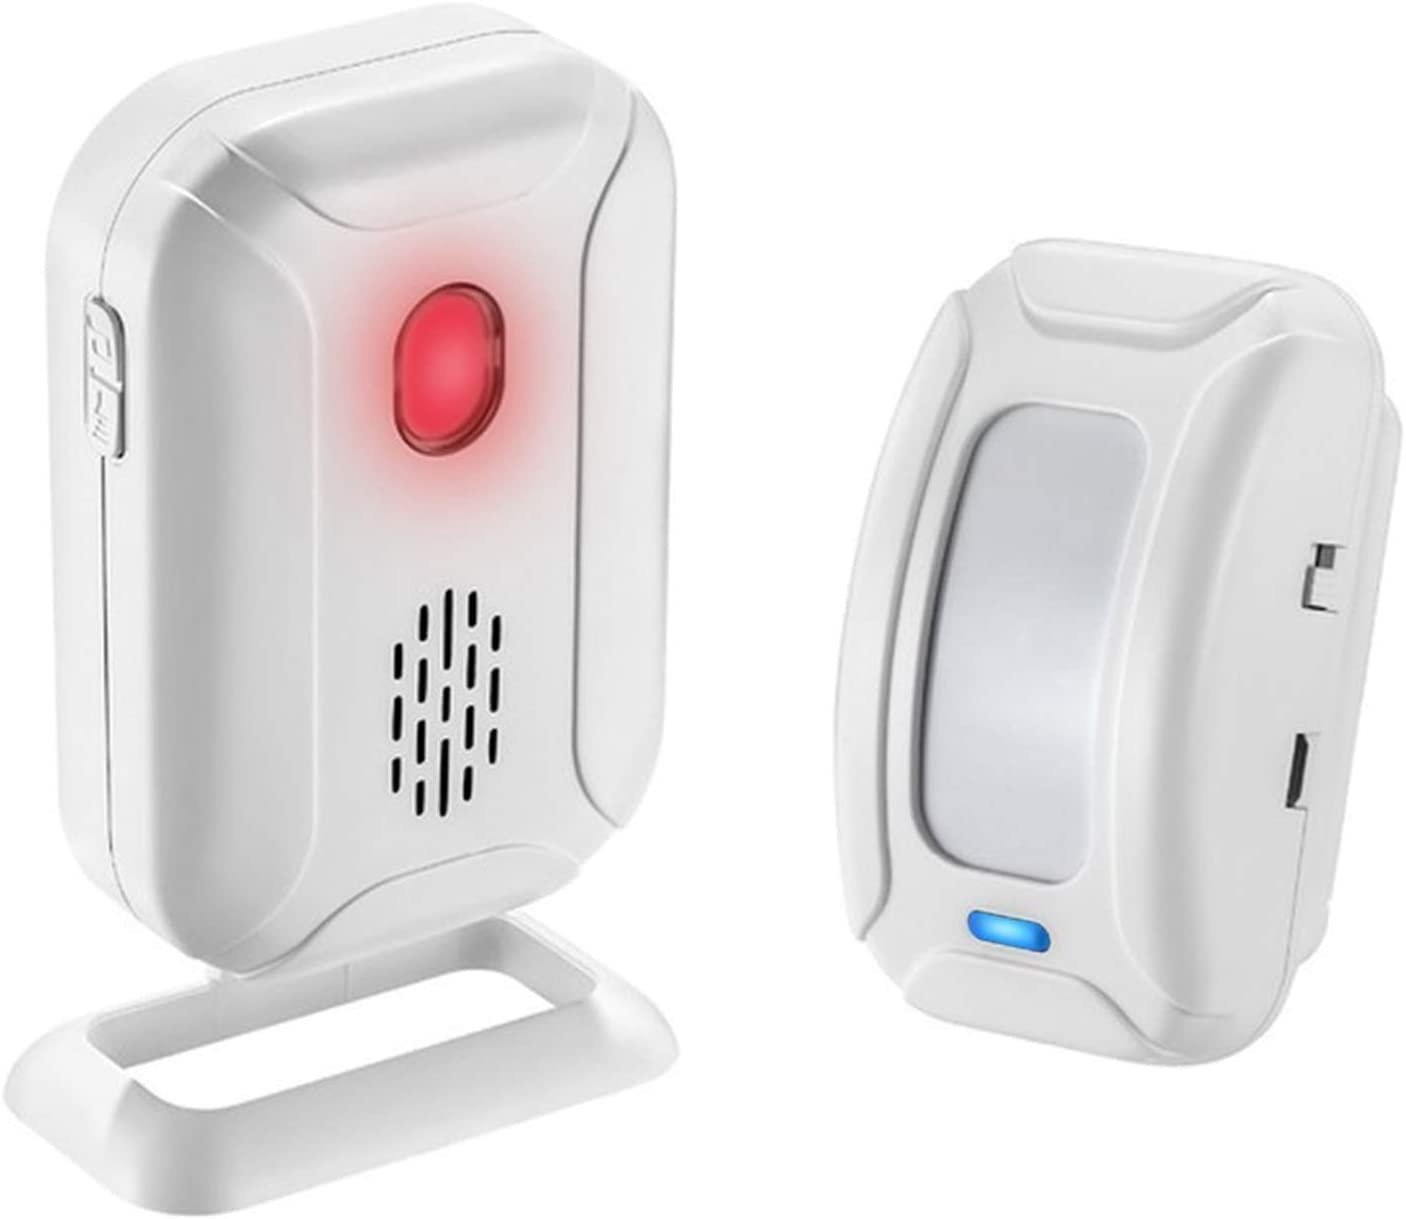 KCMYTONER Wireless Infrared Doorbell Welcome Chime Kit - 1 PIR Motion Door Alarm Sensor,1 Receiver (Range at 918ft 36 Chime Melodies) Store Home Security Alert …